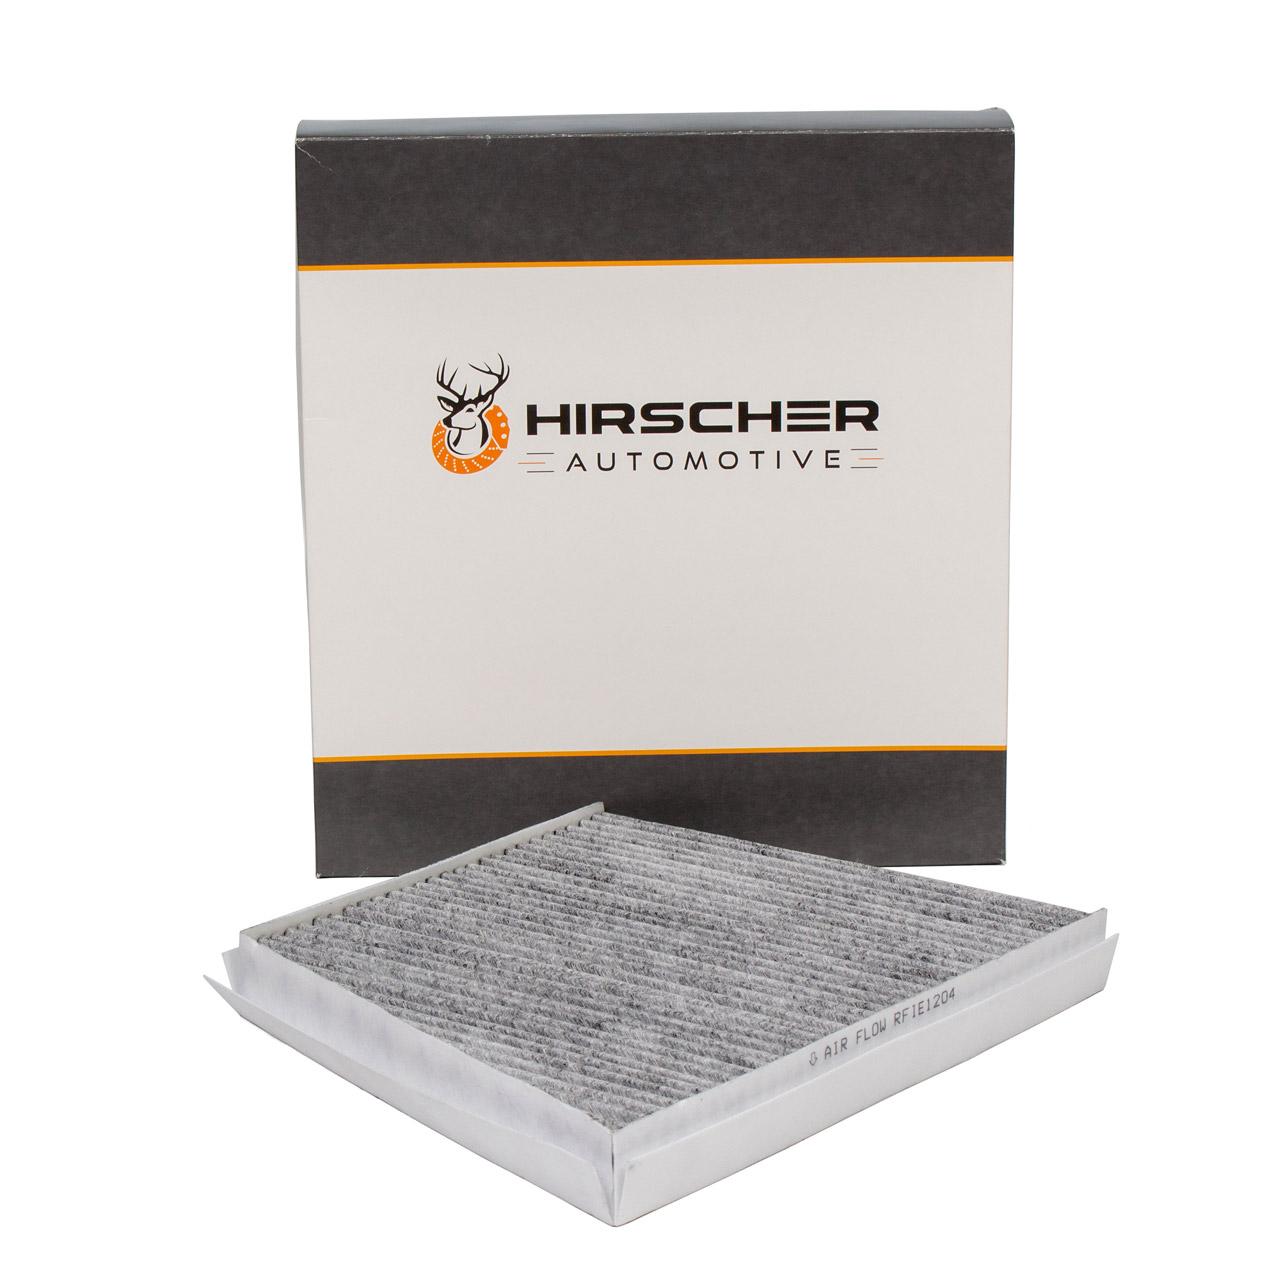 HIRSCHER Innenraumfilter Aktivkohle MERCEDES E-Klasse W211 S211 CLS C219 2118300018